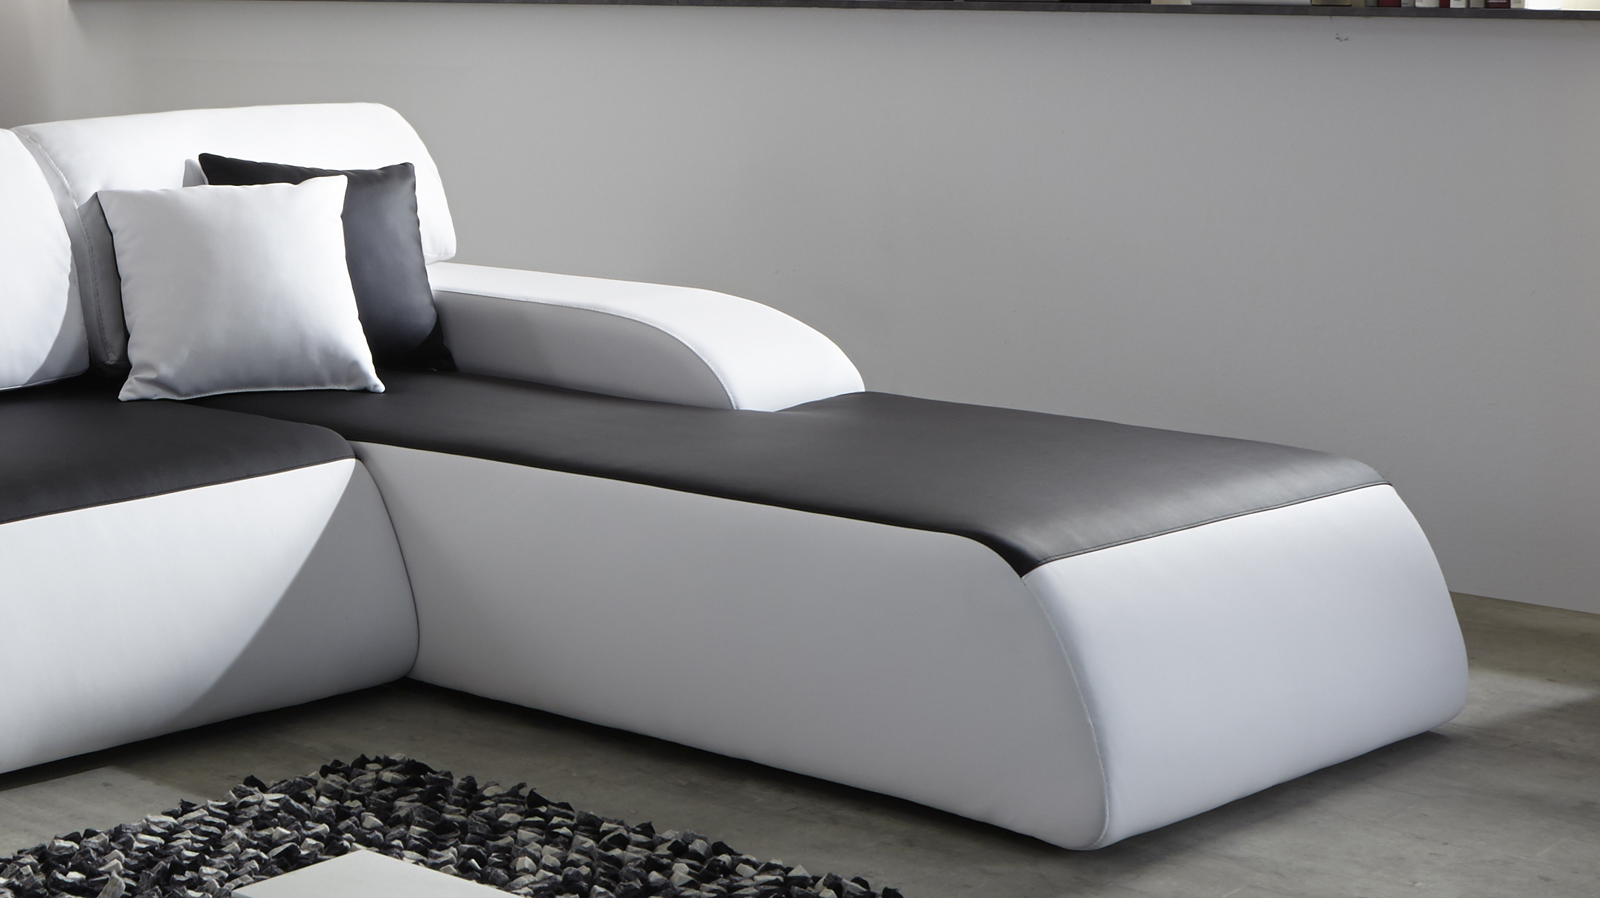 sam ecksofa schwarz wei sol 280 x 220 cm g nstig. Black Bedroom Furniture Sets. Home Design Ideas